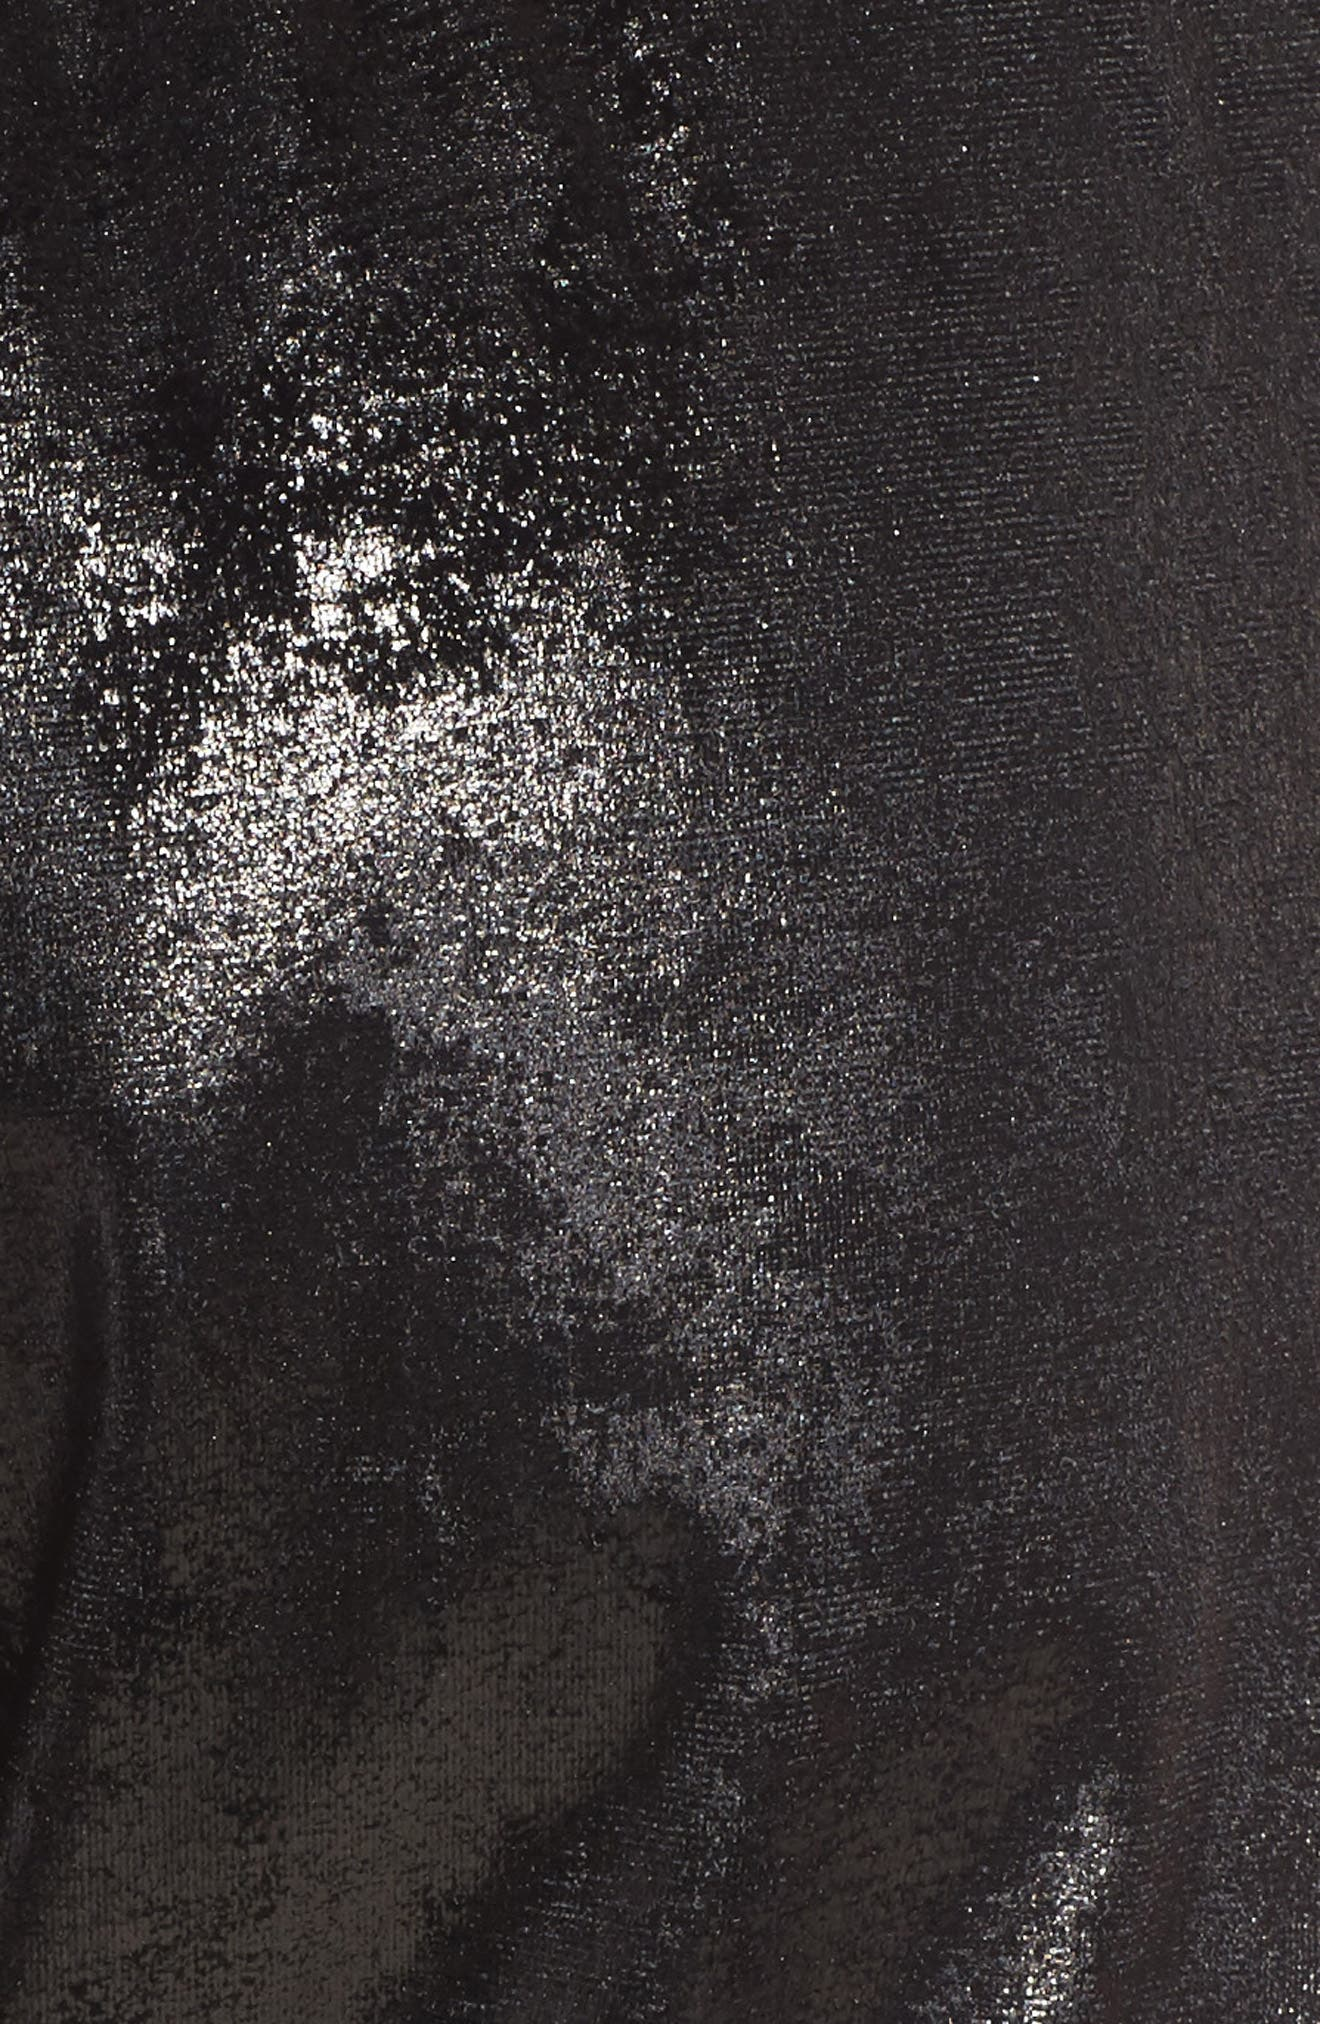 Randall Cuffed Sweatpants,                             Alternate thumbnail 5, color,                             Black